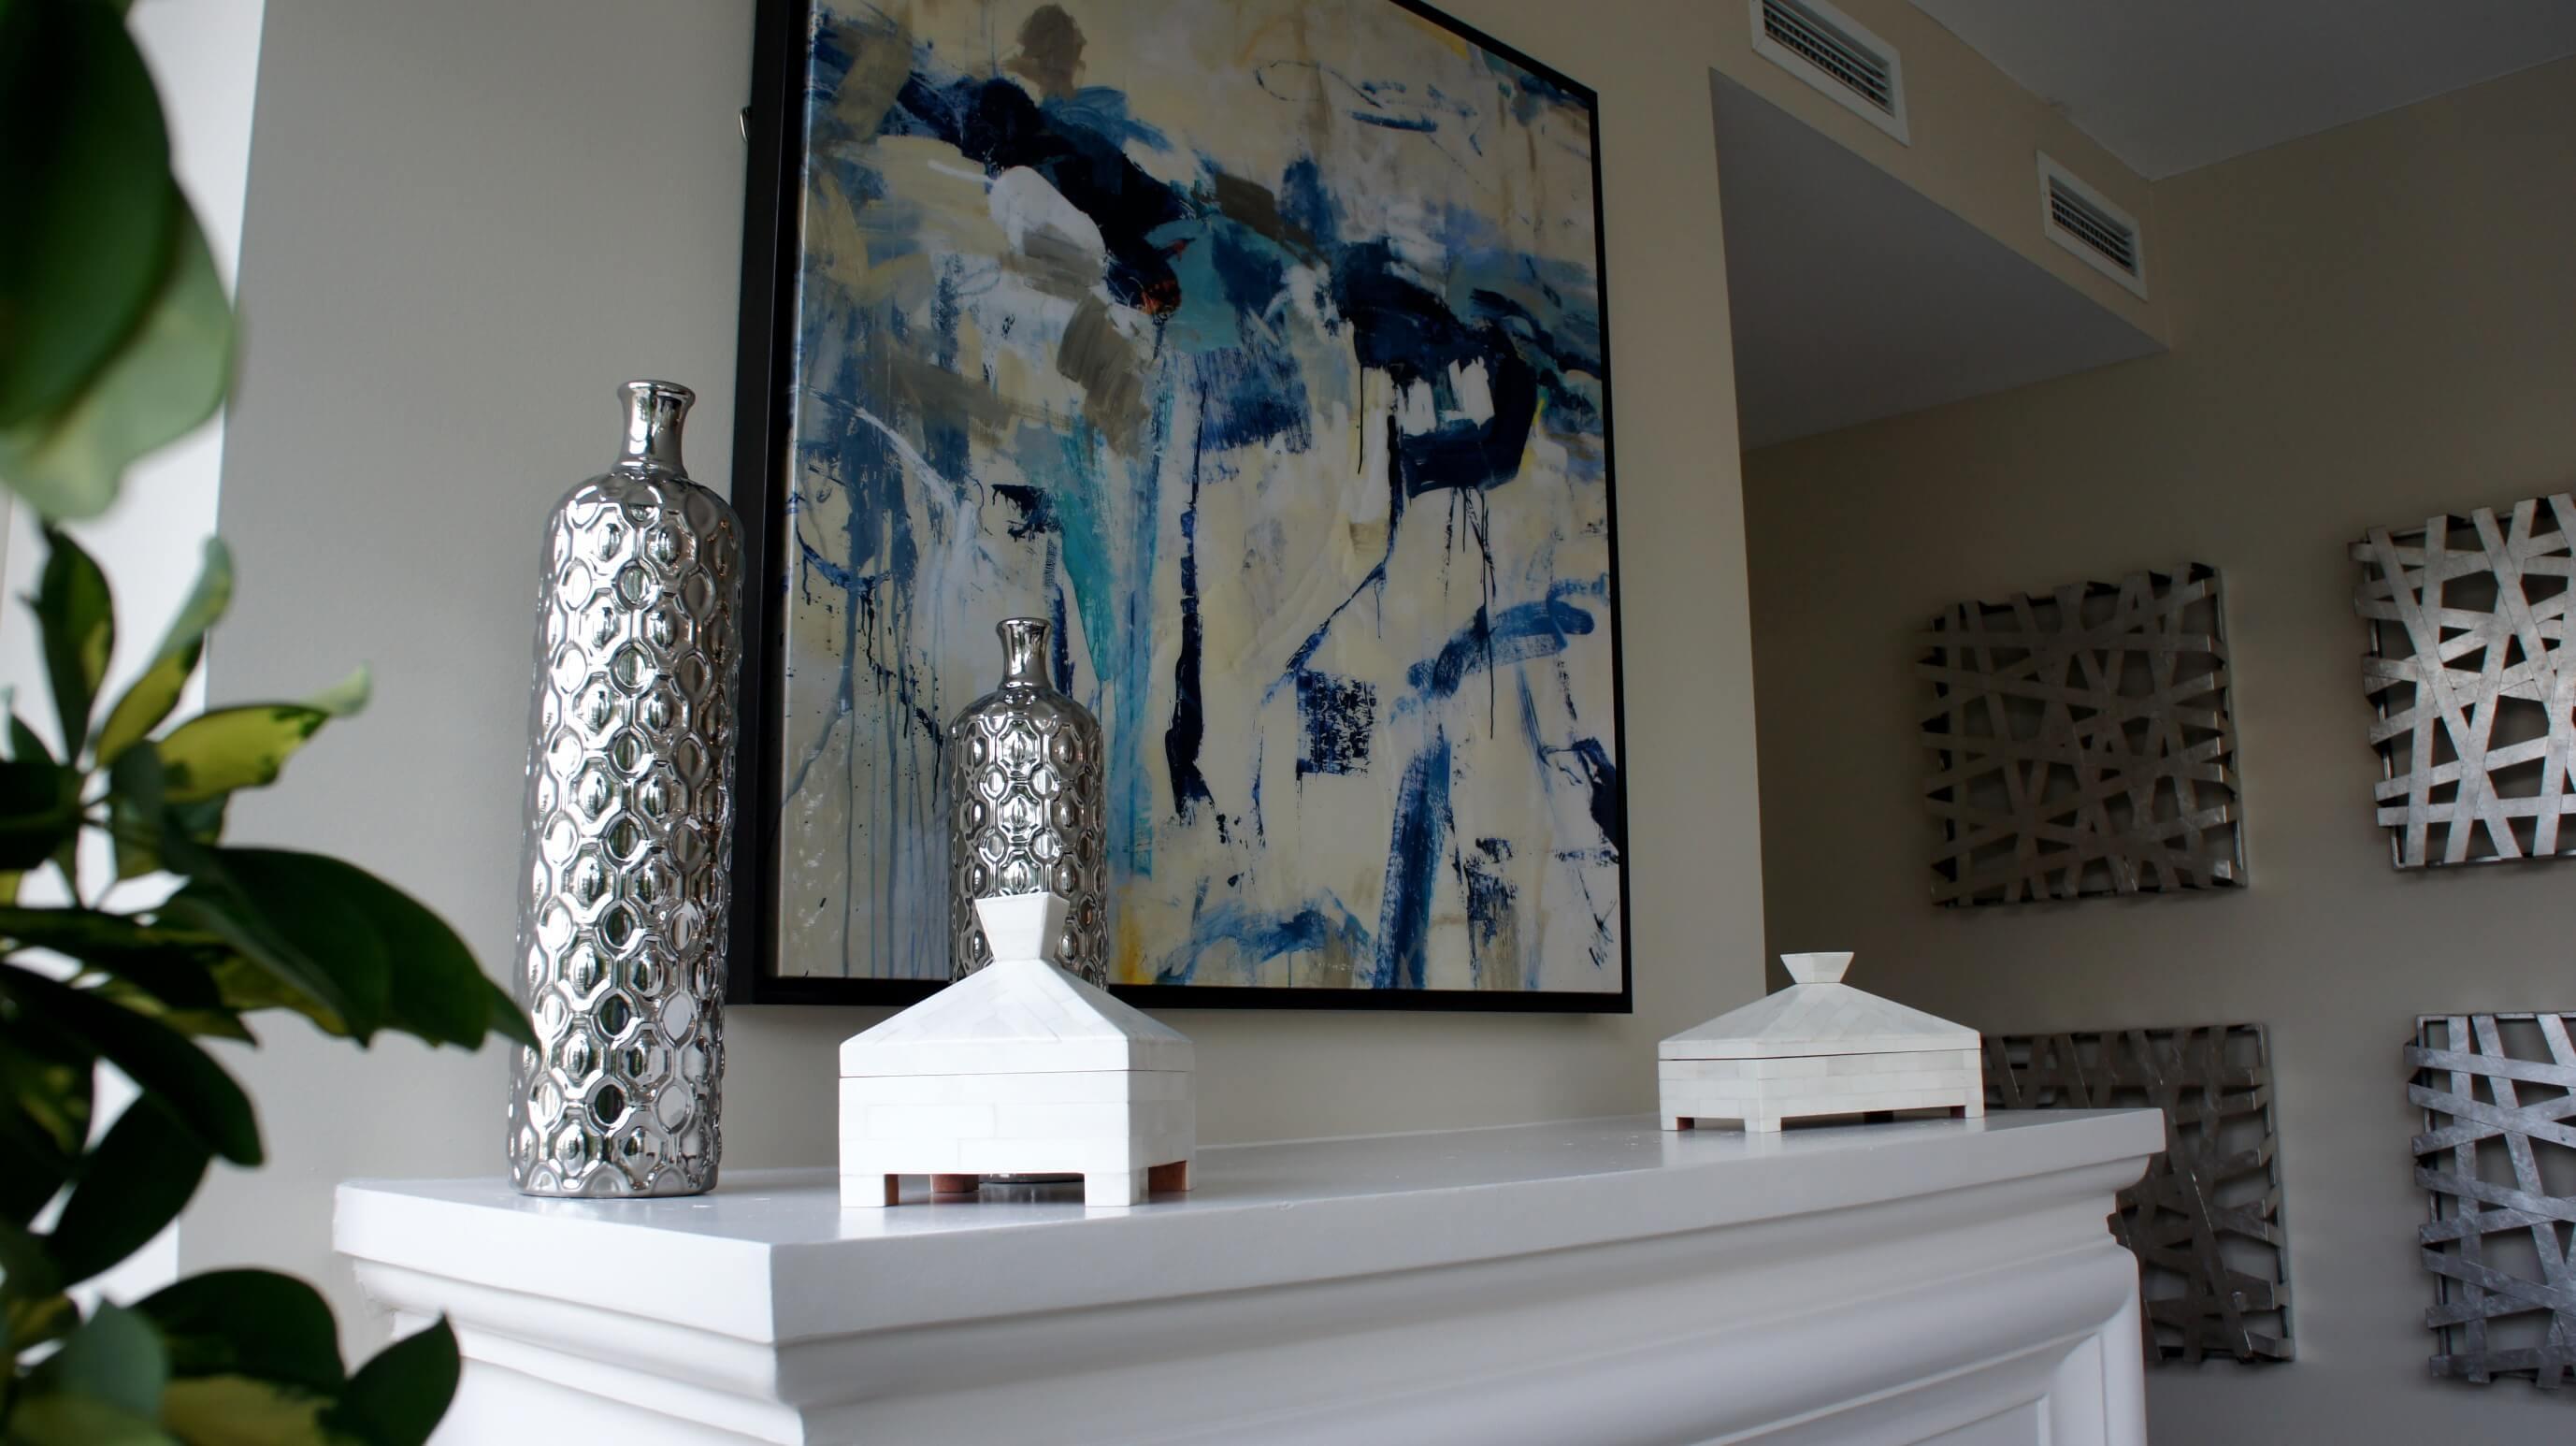 astoria-at-central-park-west-x-nubry-luxury-apartments-irvine-california-7